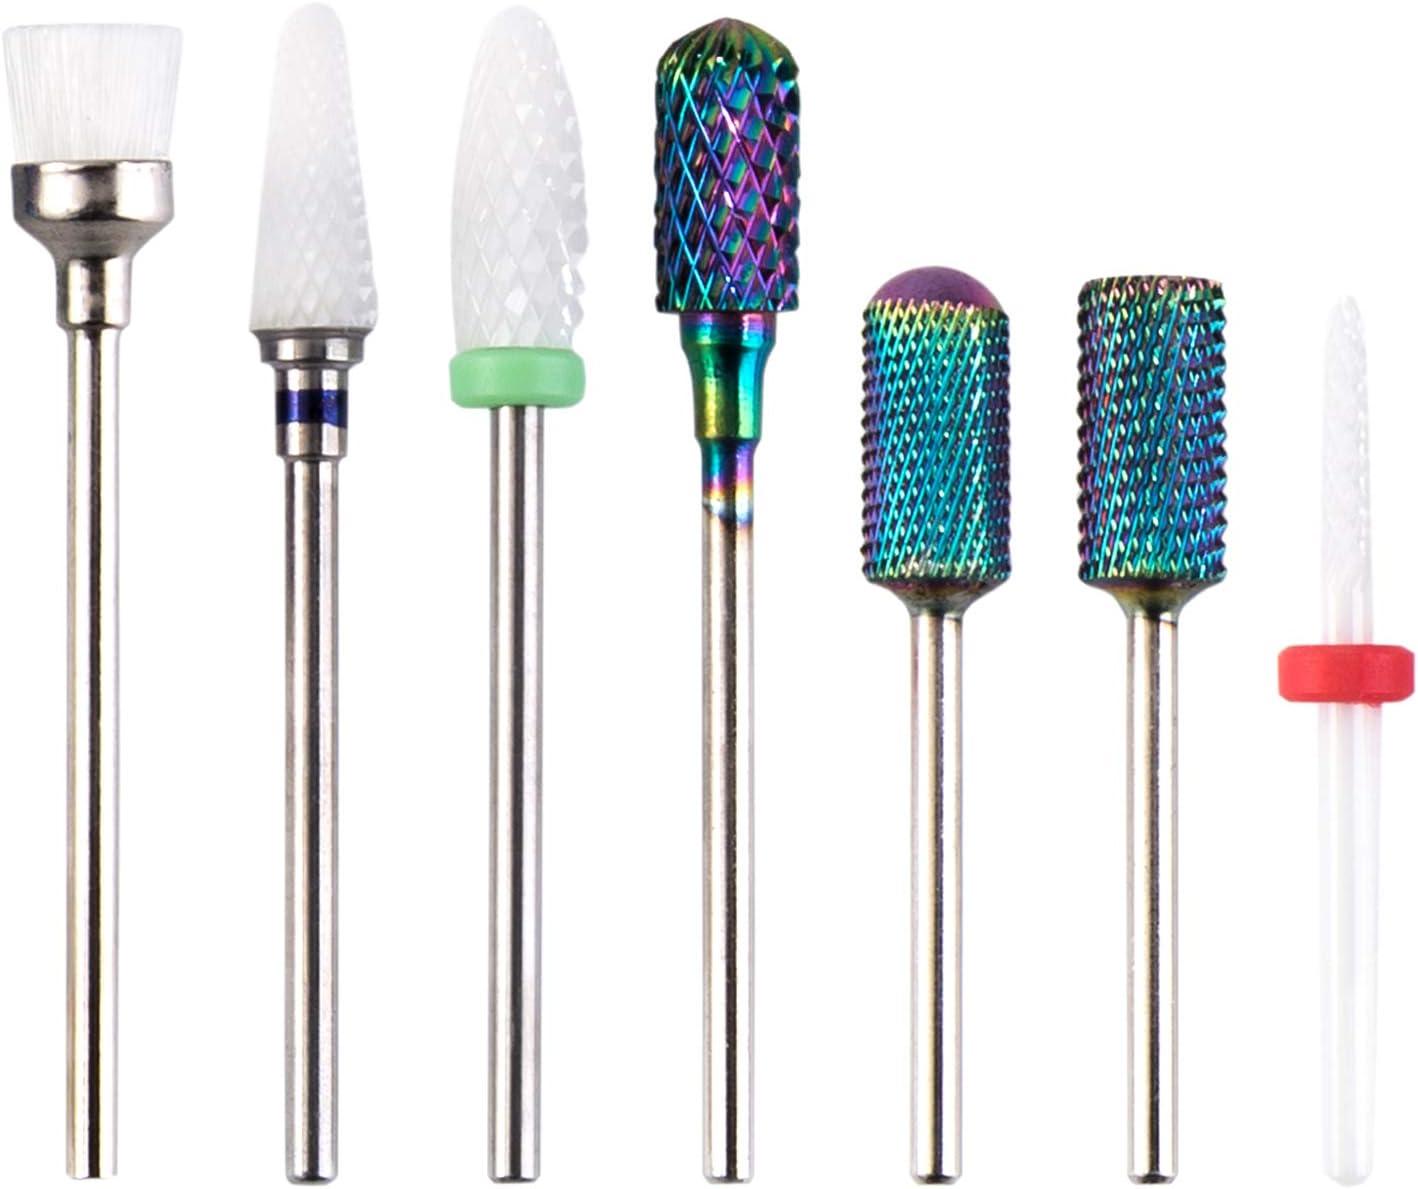 "Nail Drill Bits Set, H/E Professional 7PCS Acrylic Cuticle Nails Art Files Manicure Pedicure Tools 3/32"" for Electric Nail Files Drill Machine Manicure Pedicure Home Salon Use"